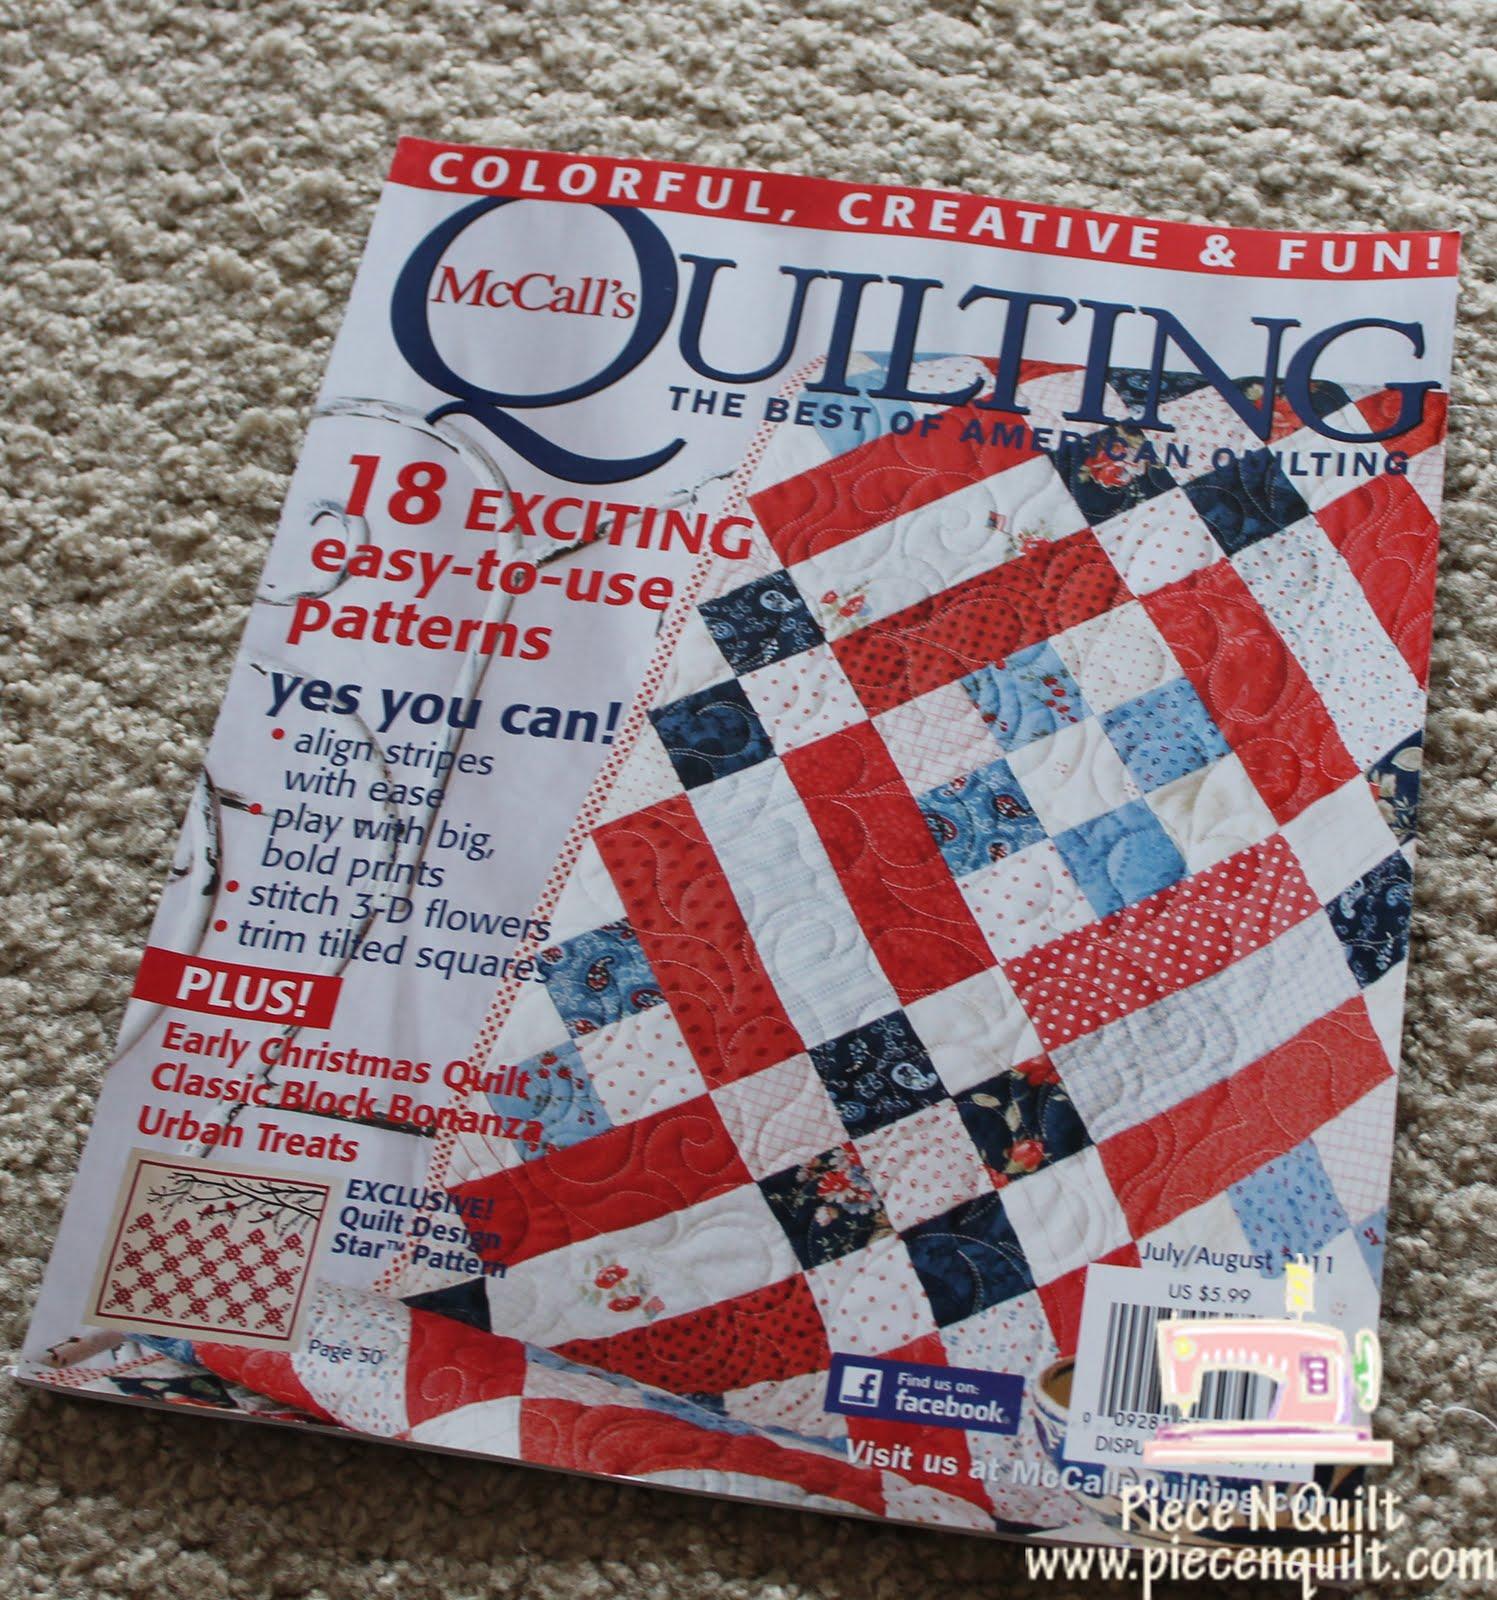 Piece N Quilt: It's for the Birds {McCalls Quilting Magazine} : mccalls quilting - Adamdwight.com